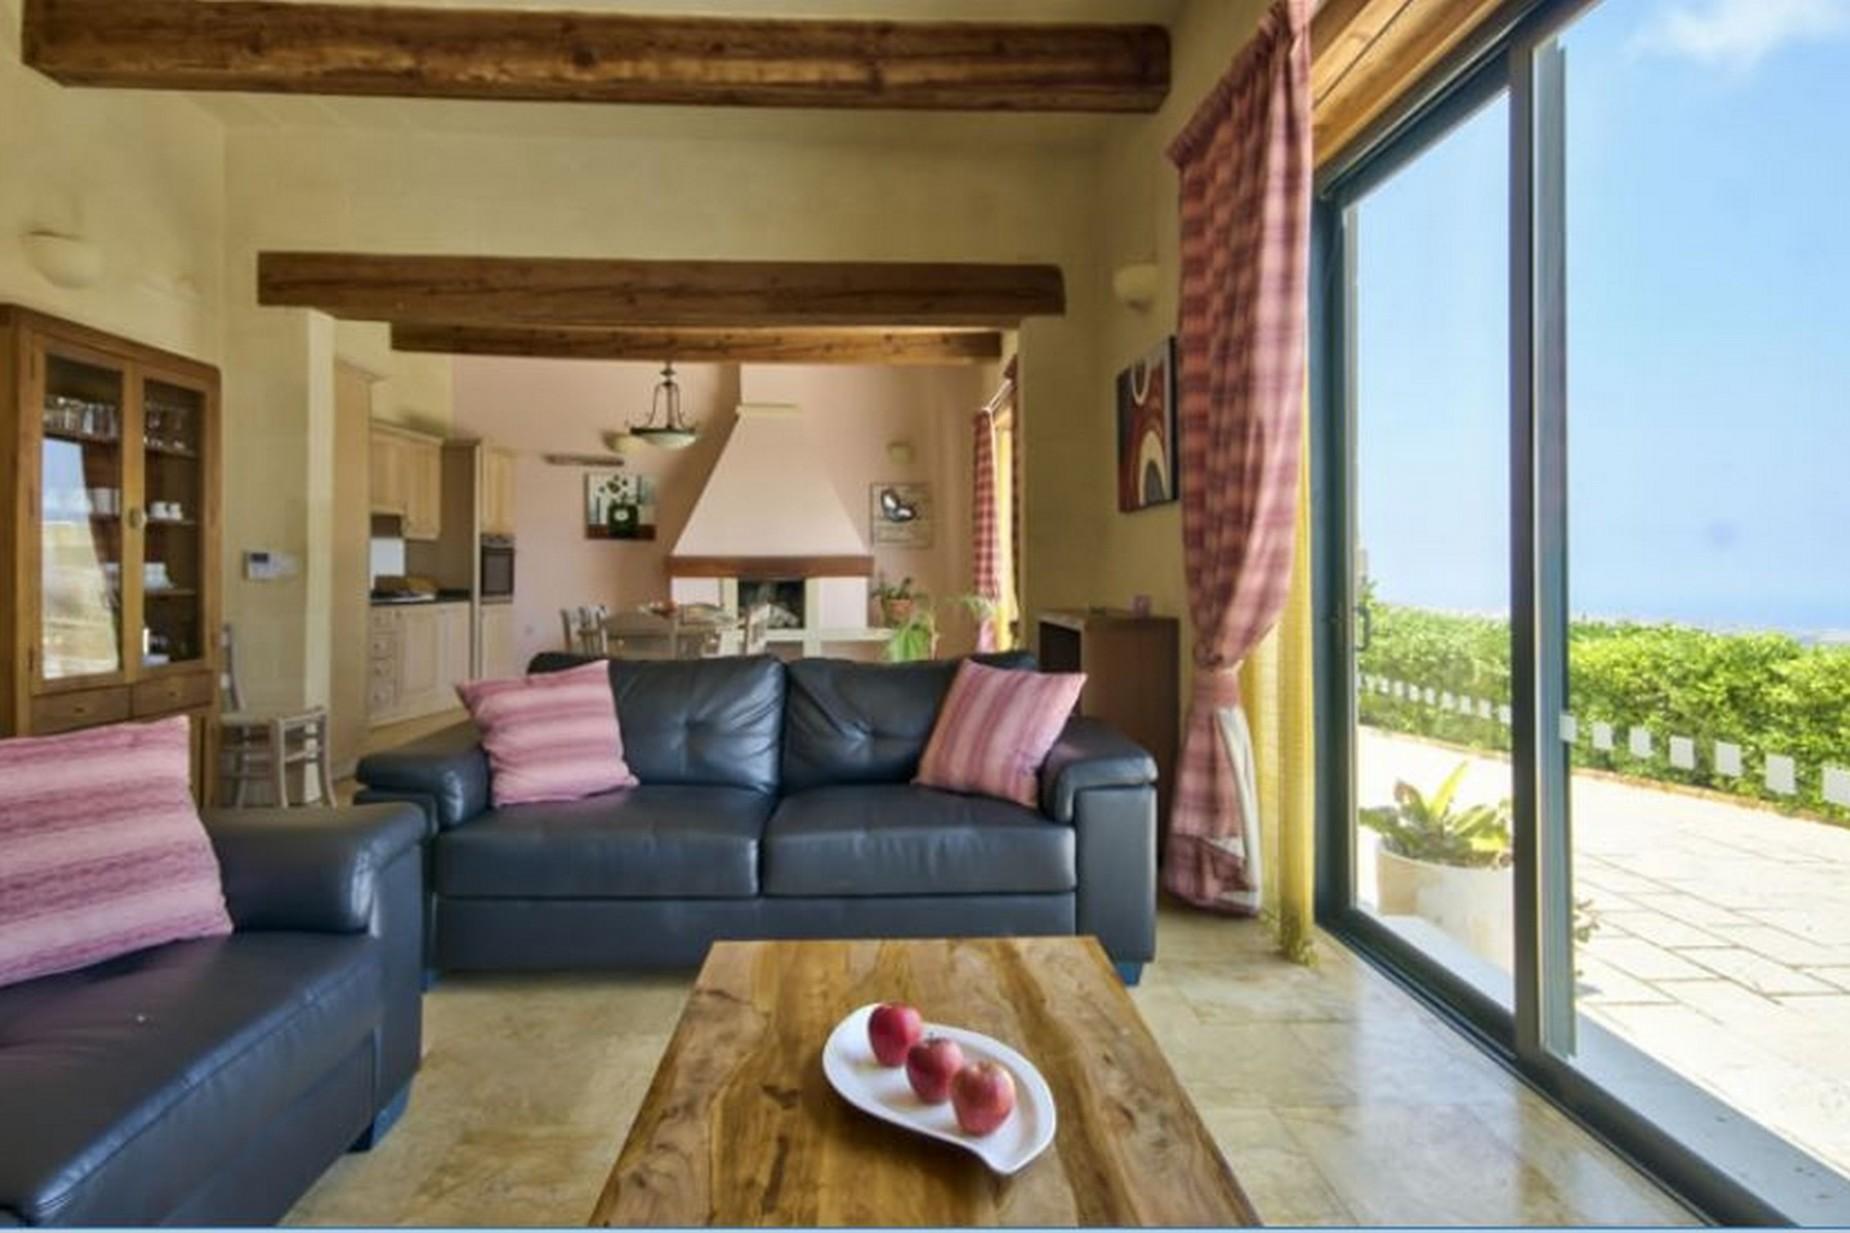 4 bed Farmhouse For Sale in Kercem, Kercem - thumb 3